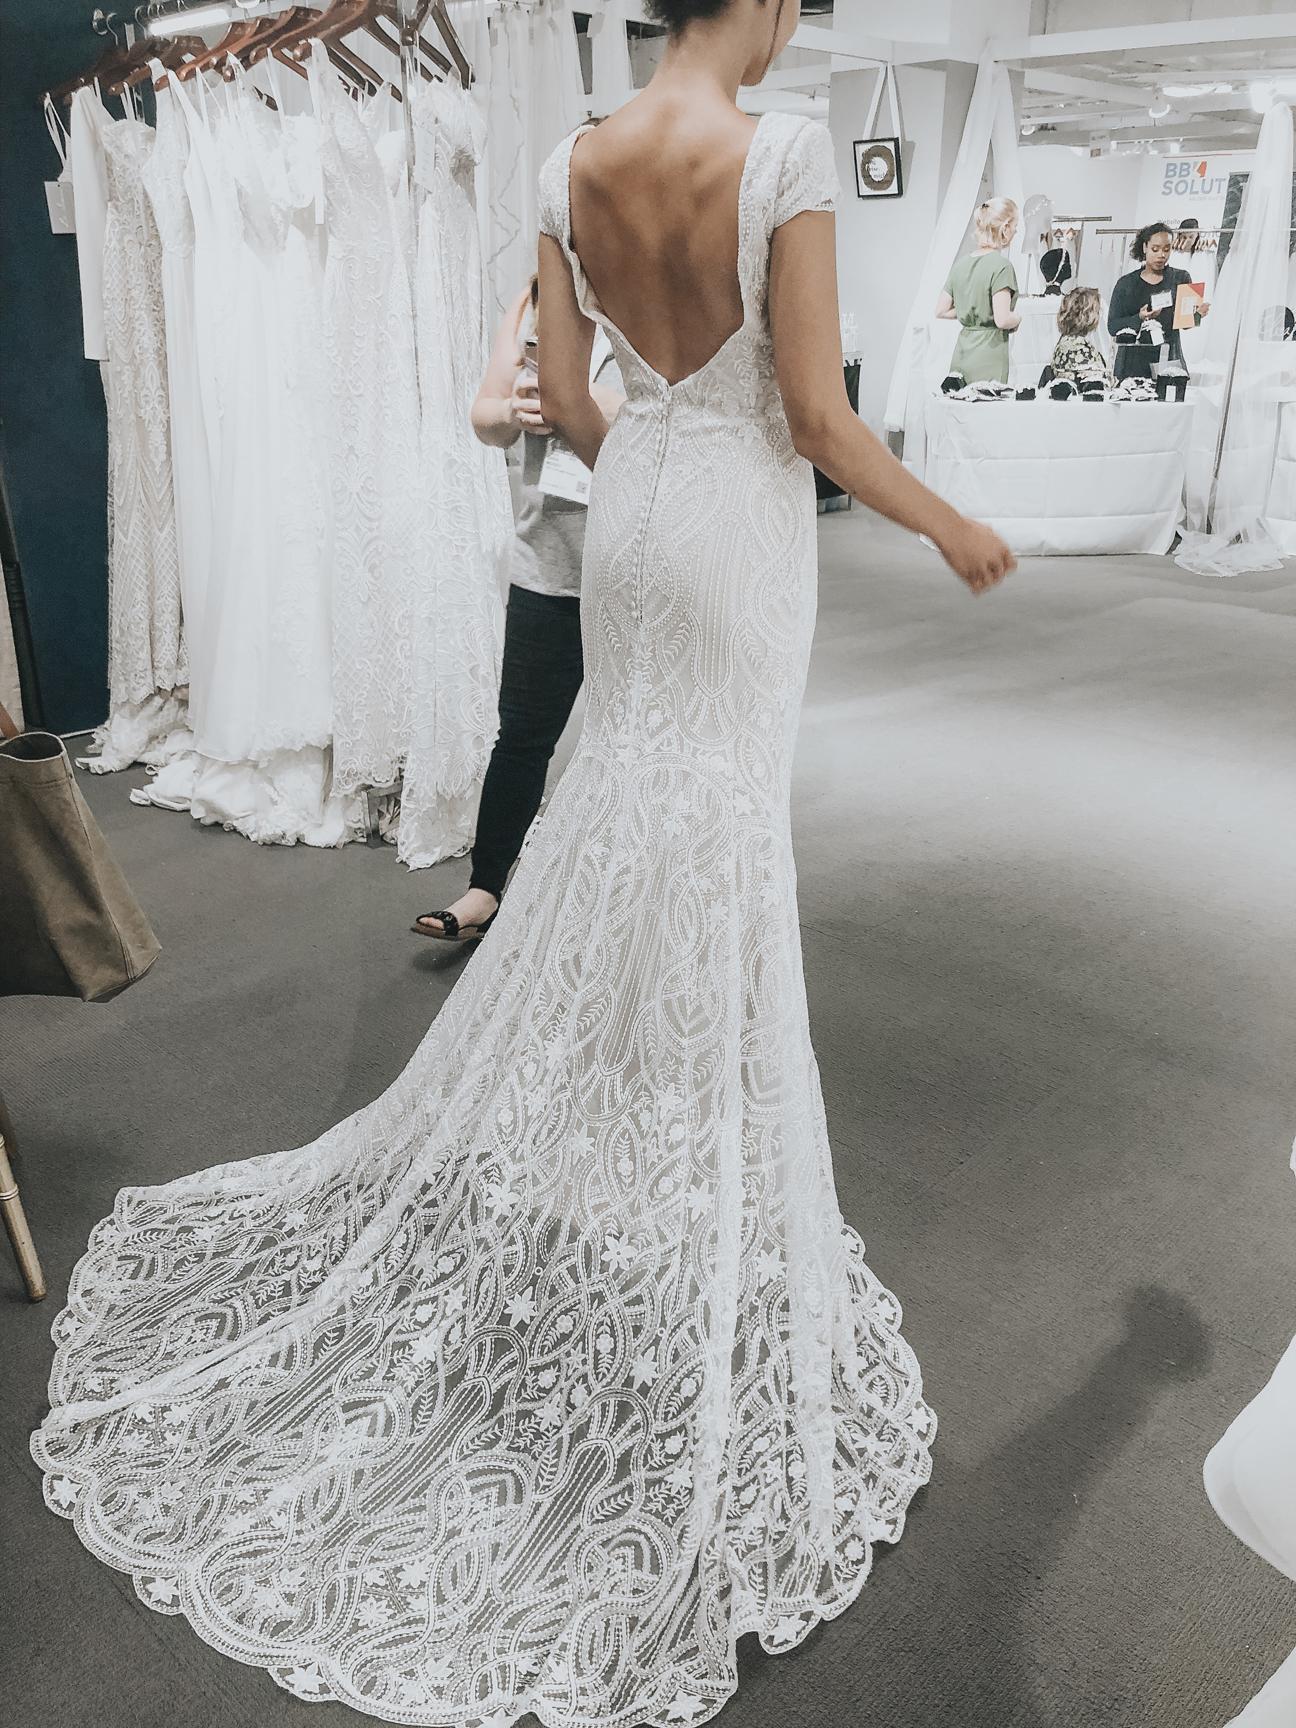 Lis-Simon-2020-Market-wedding-dress-couture-closet-train-long.jpg